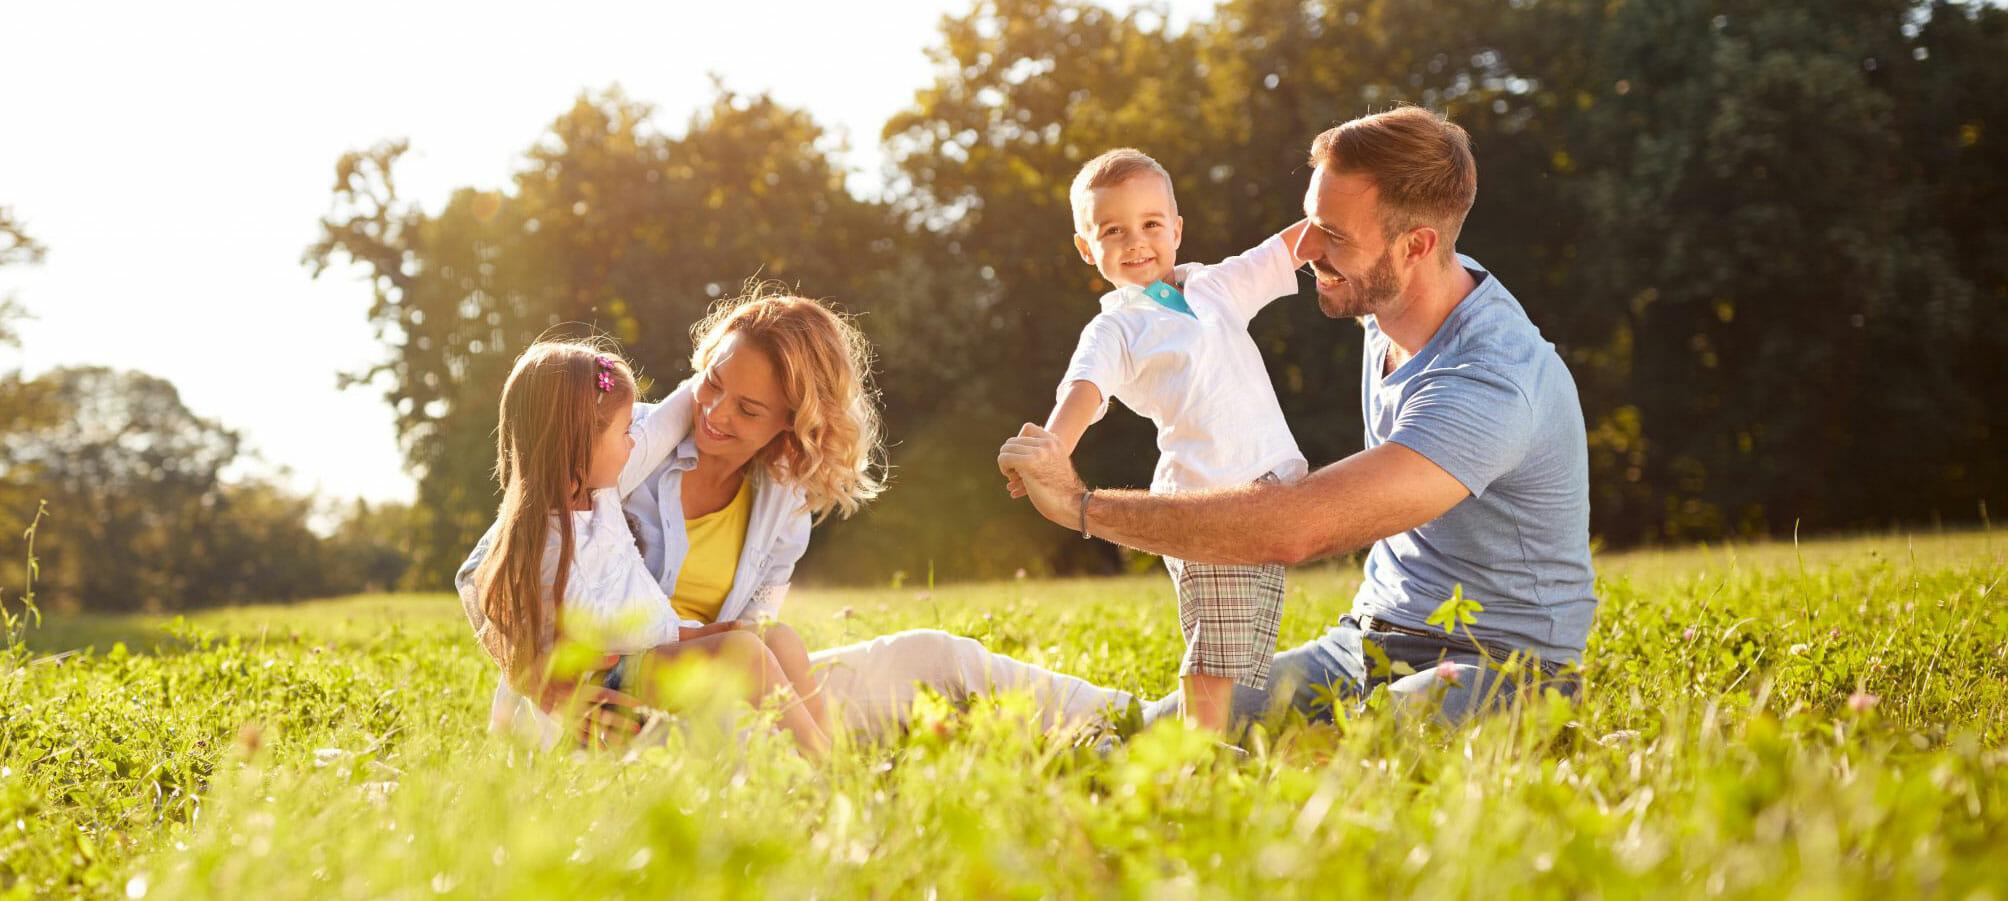 Family in park smiling